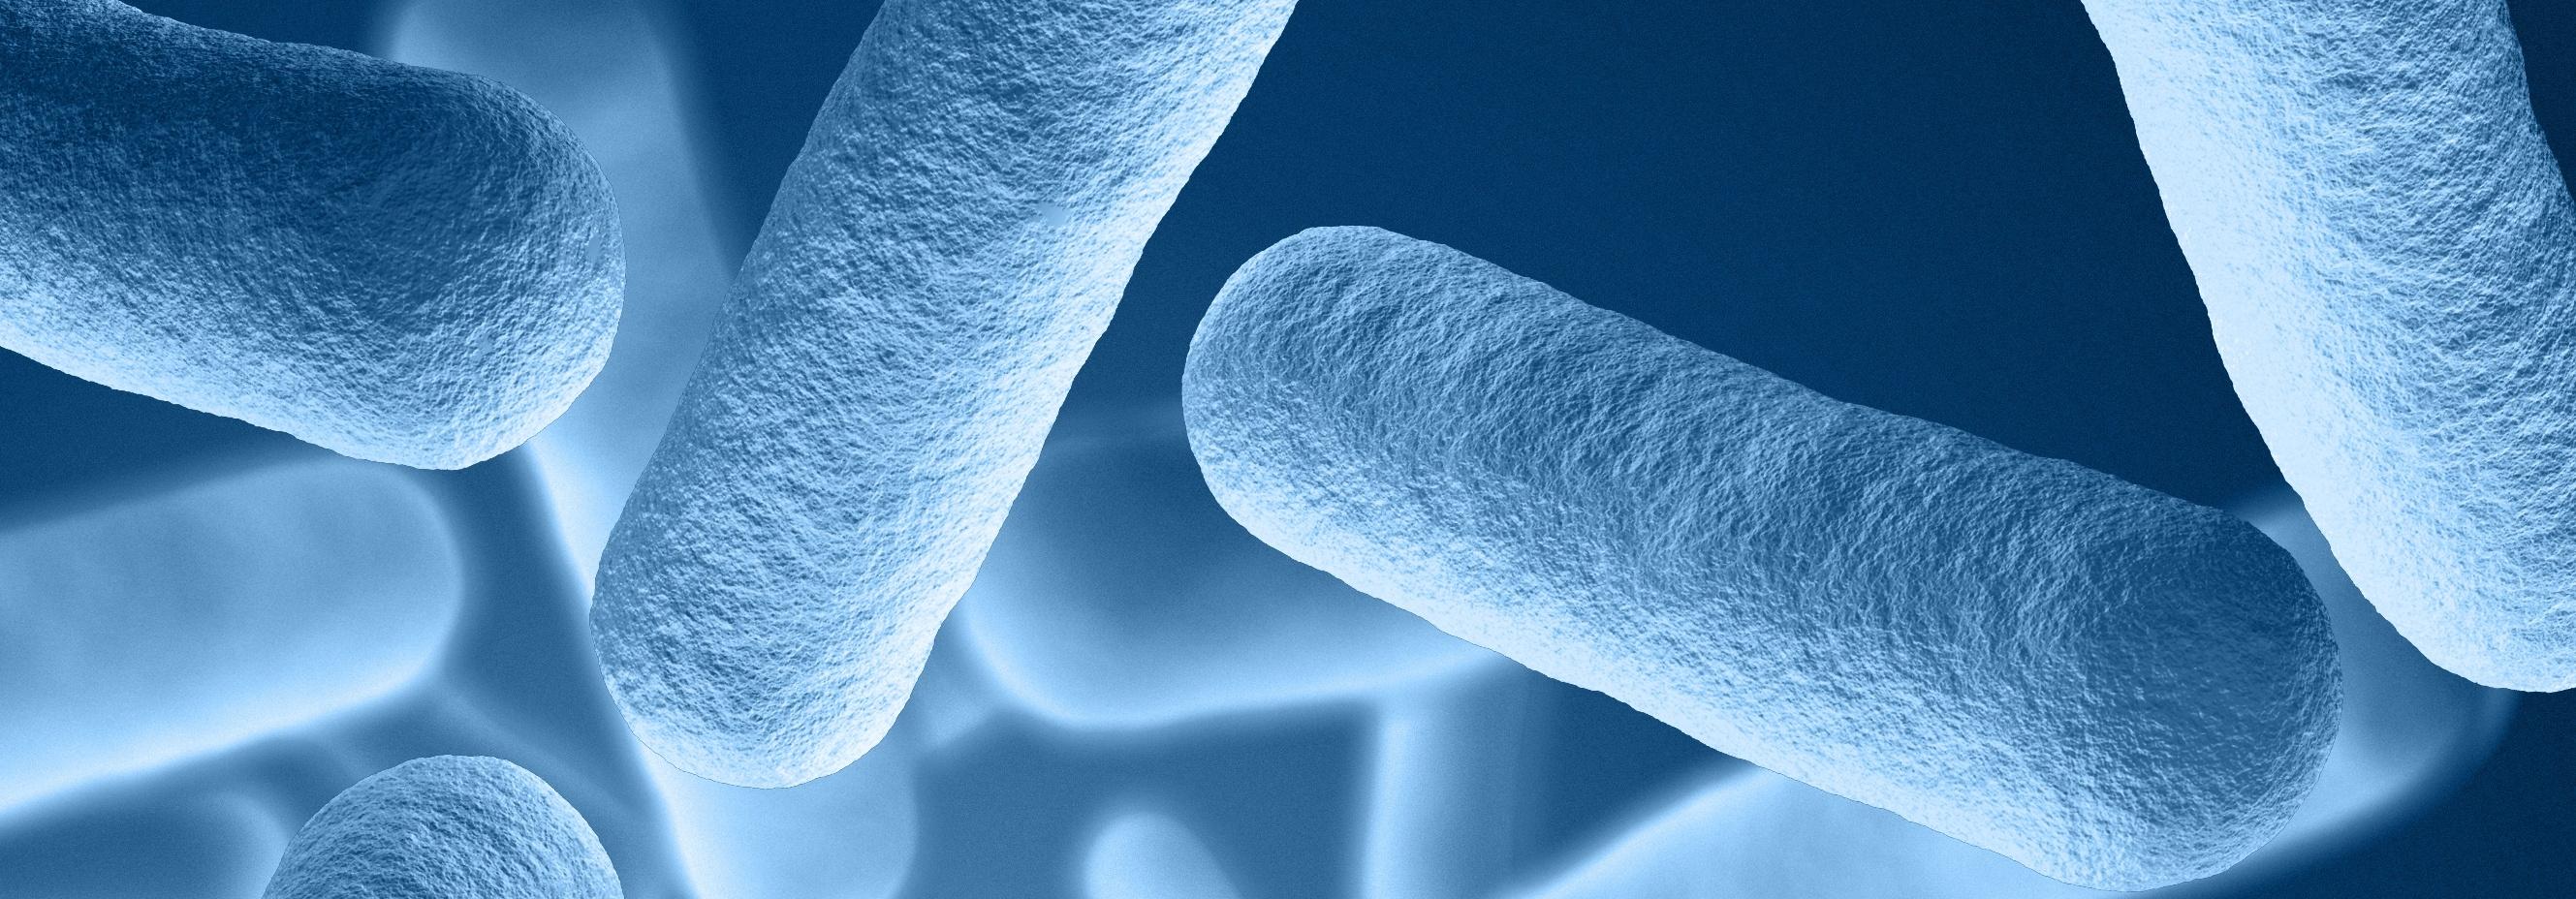 bigstock-Bacteria-virus-under-microscop-40050058-cropped